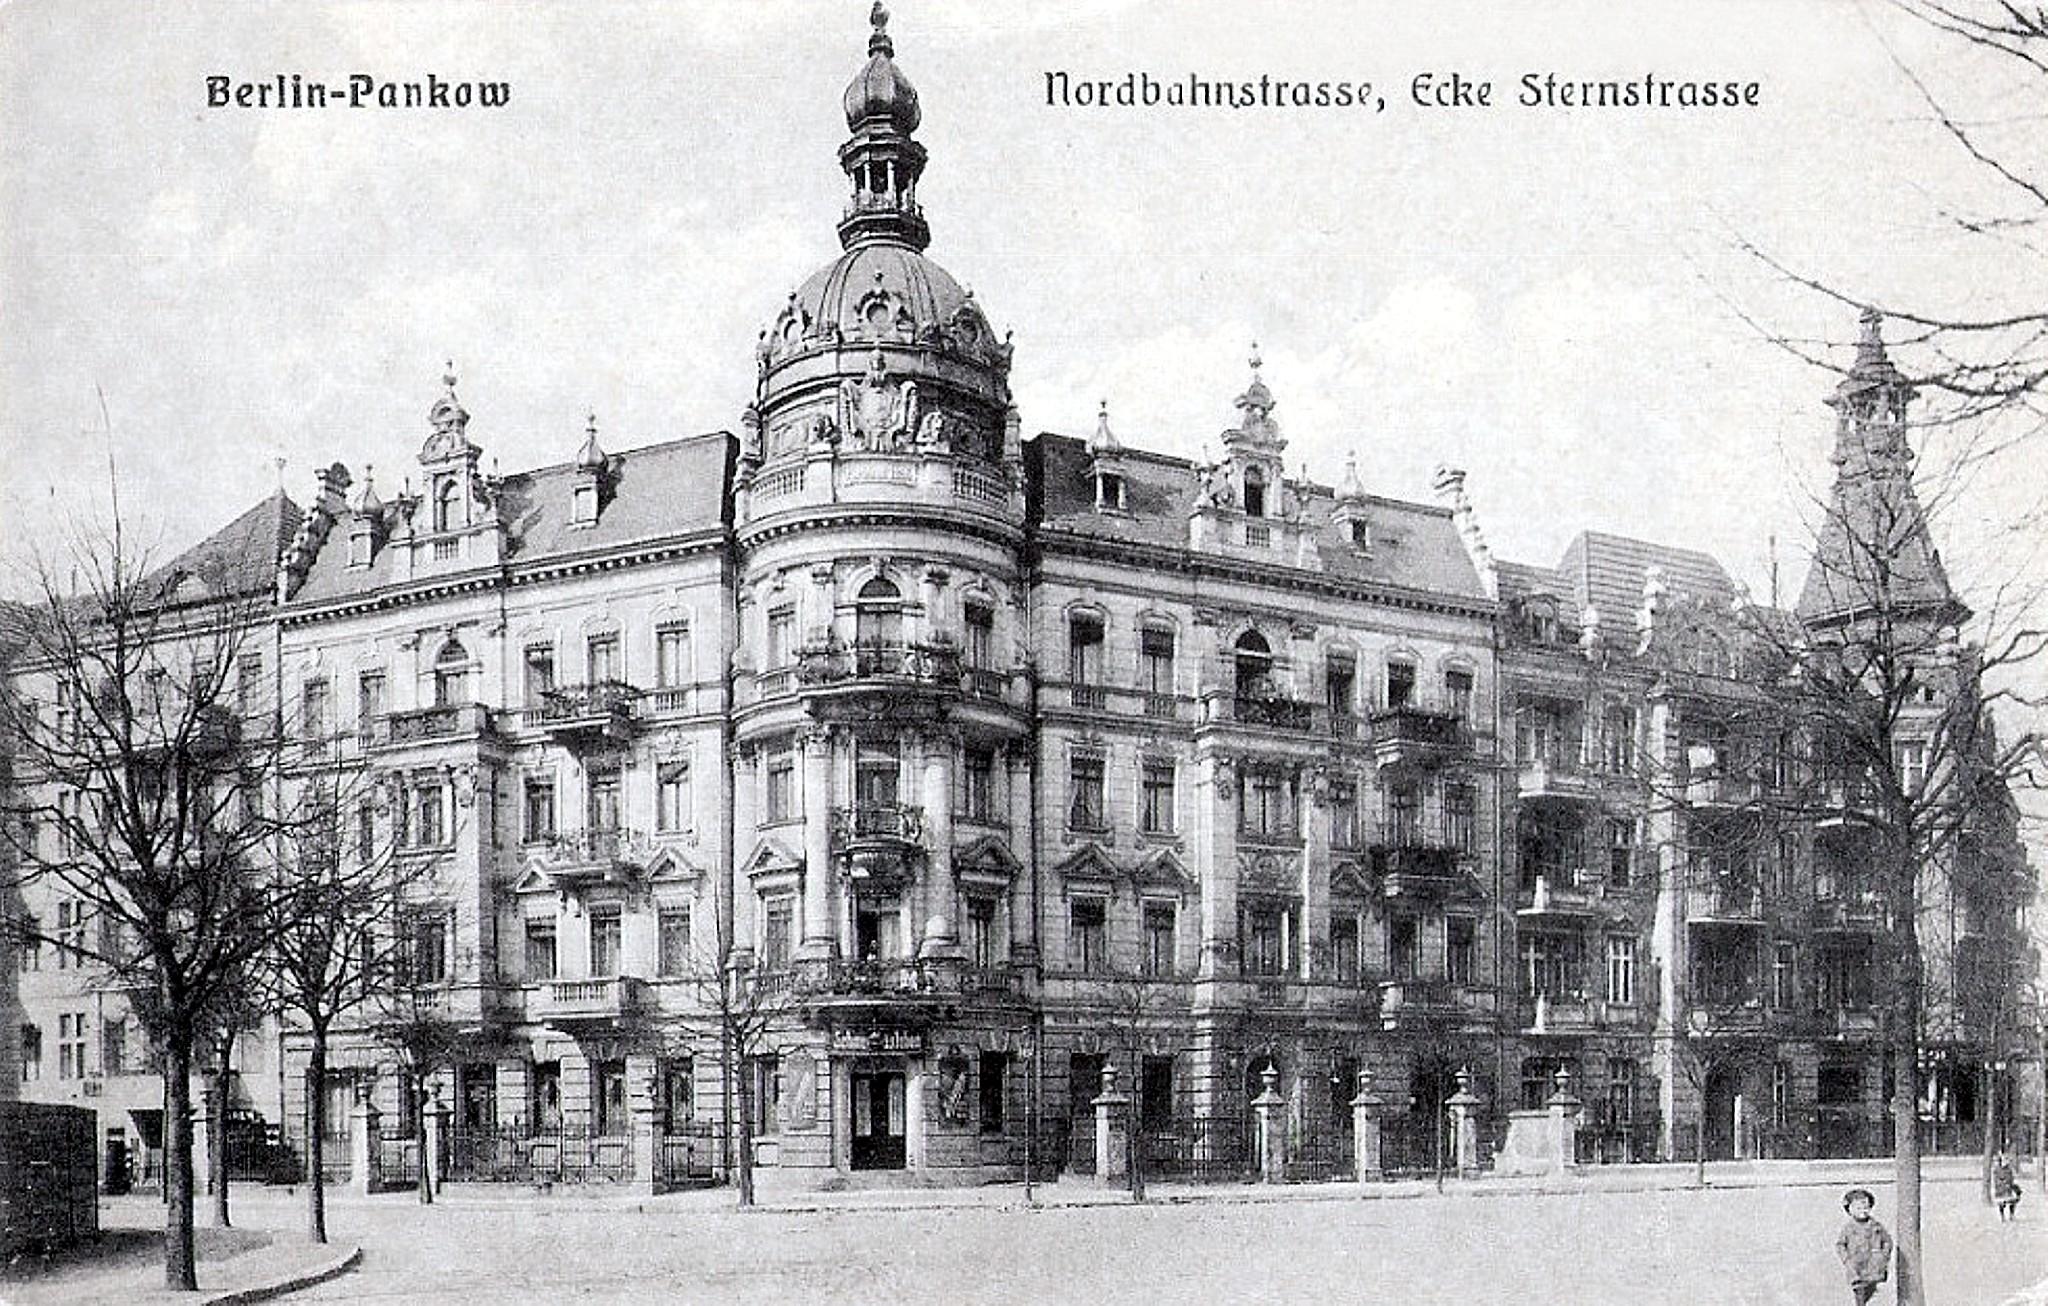 Berlin-Pankow 1905, Nordbahnstraße